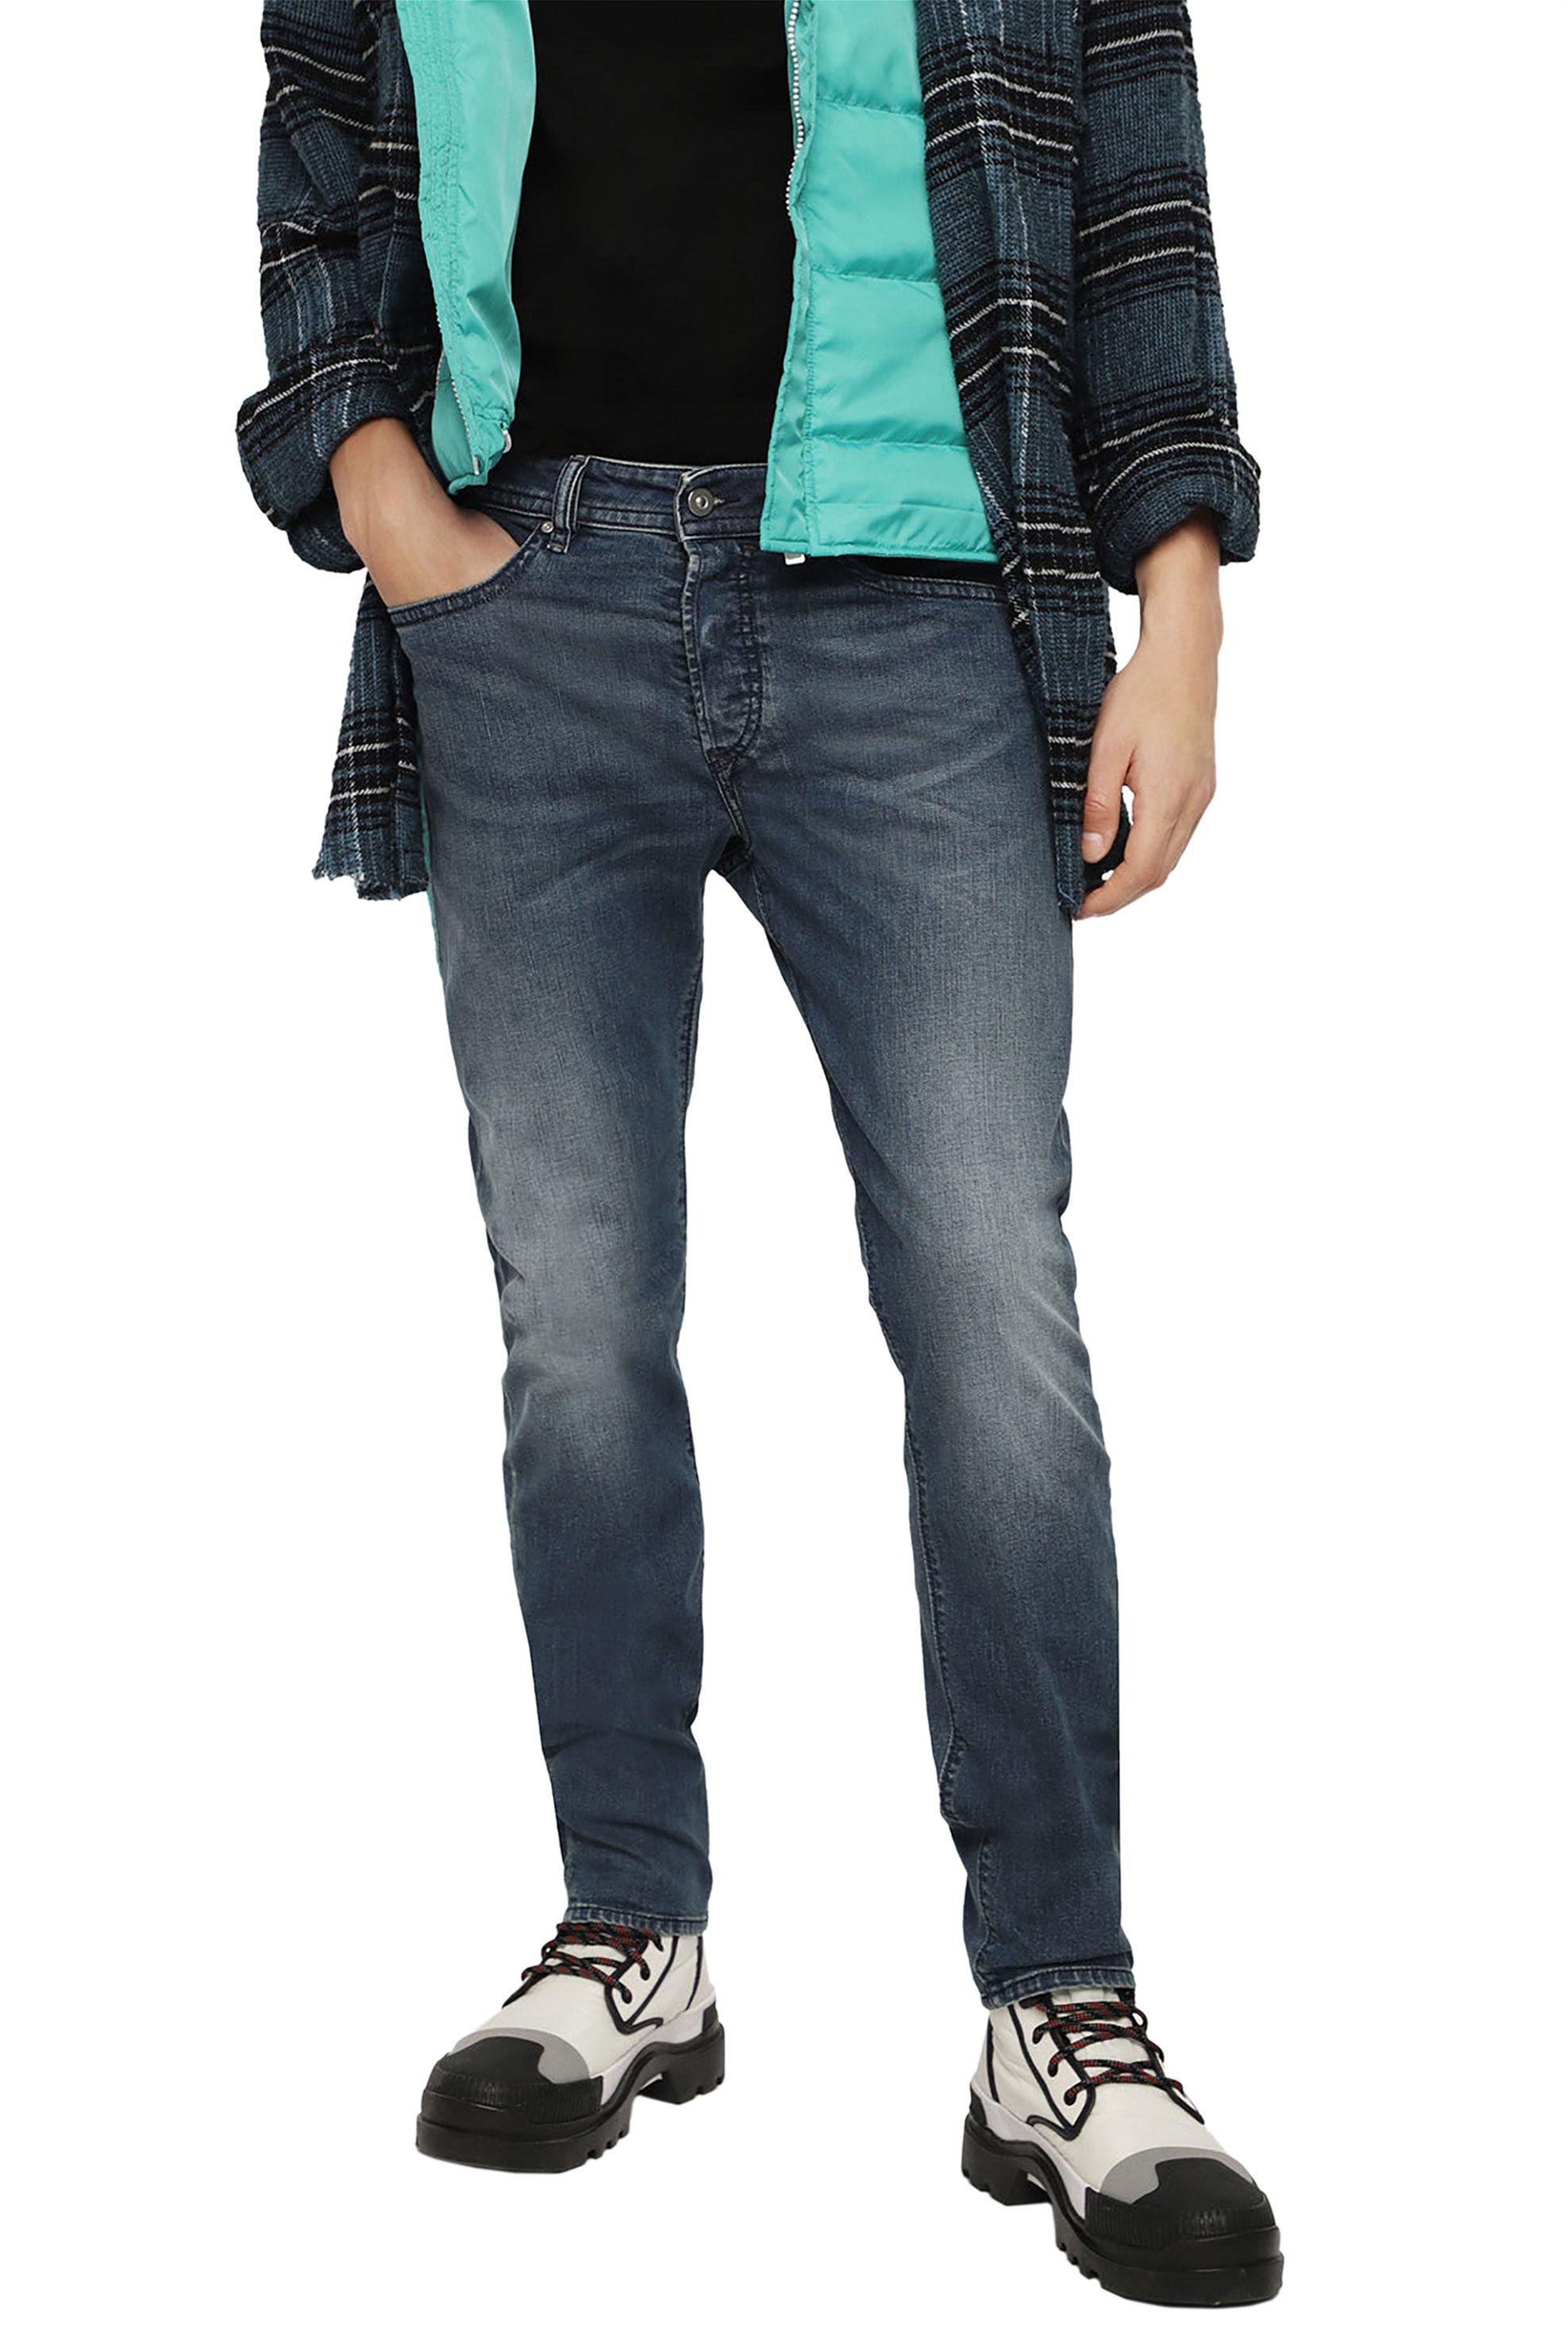 Diesel ανδρικό τζην παντελόνι Buster (32L) - 00SDHB 084TU - Μπλε ανδρασ   ρουχα   jeans   tapered